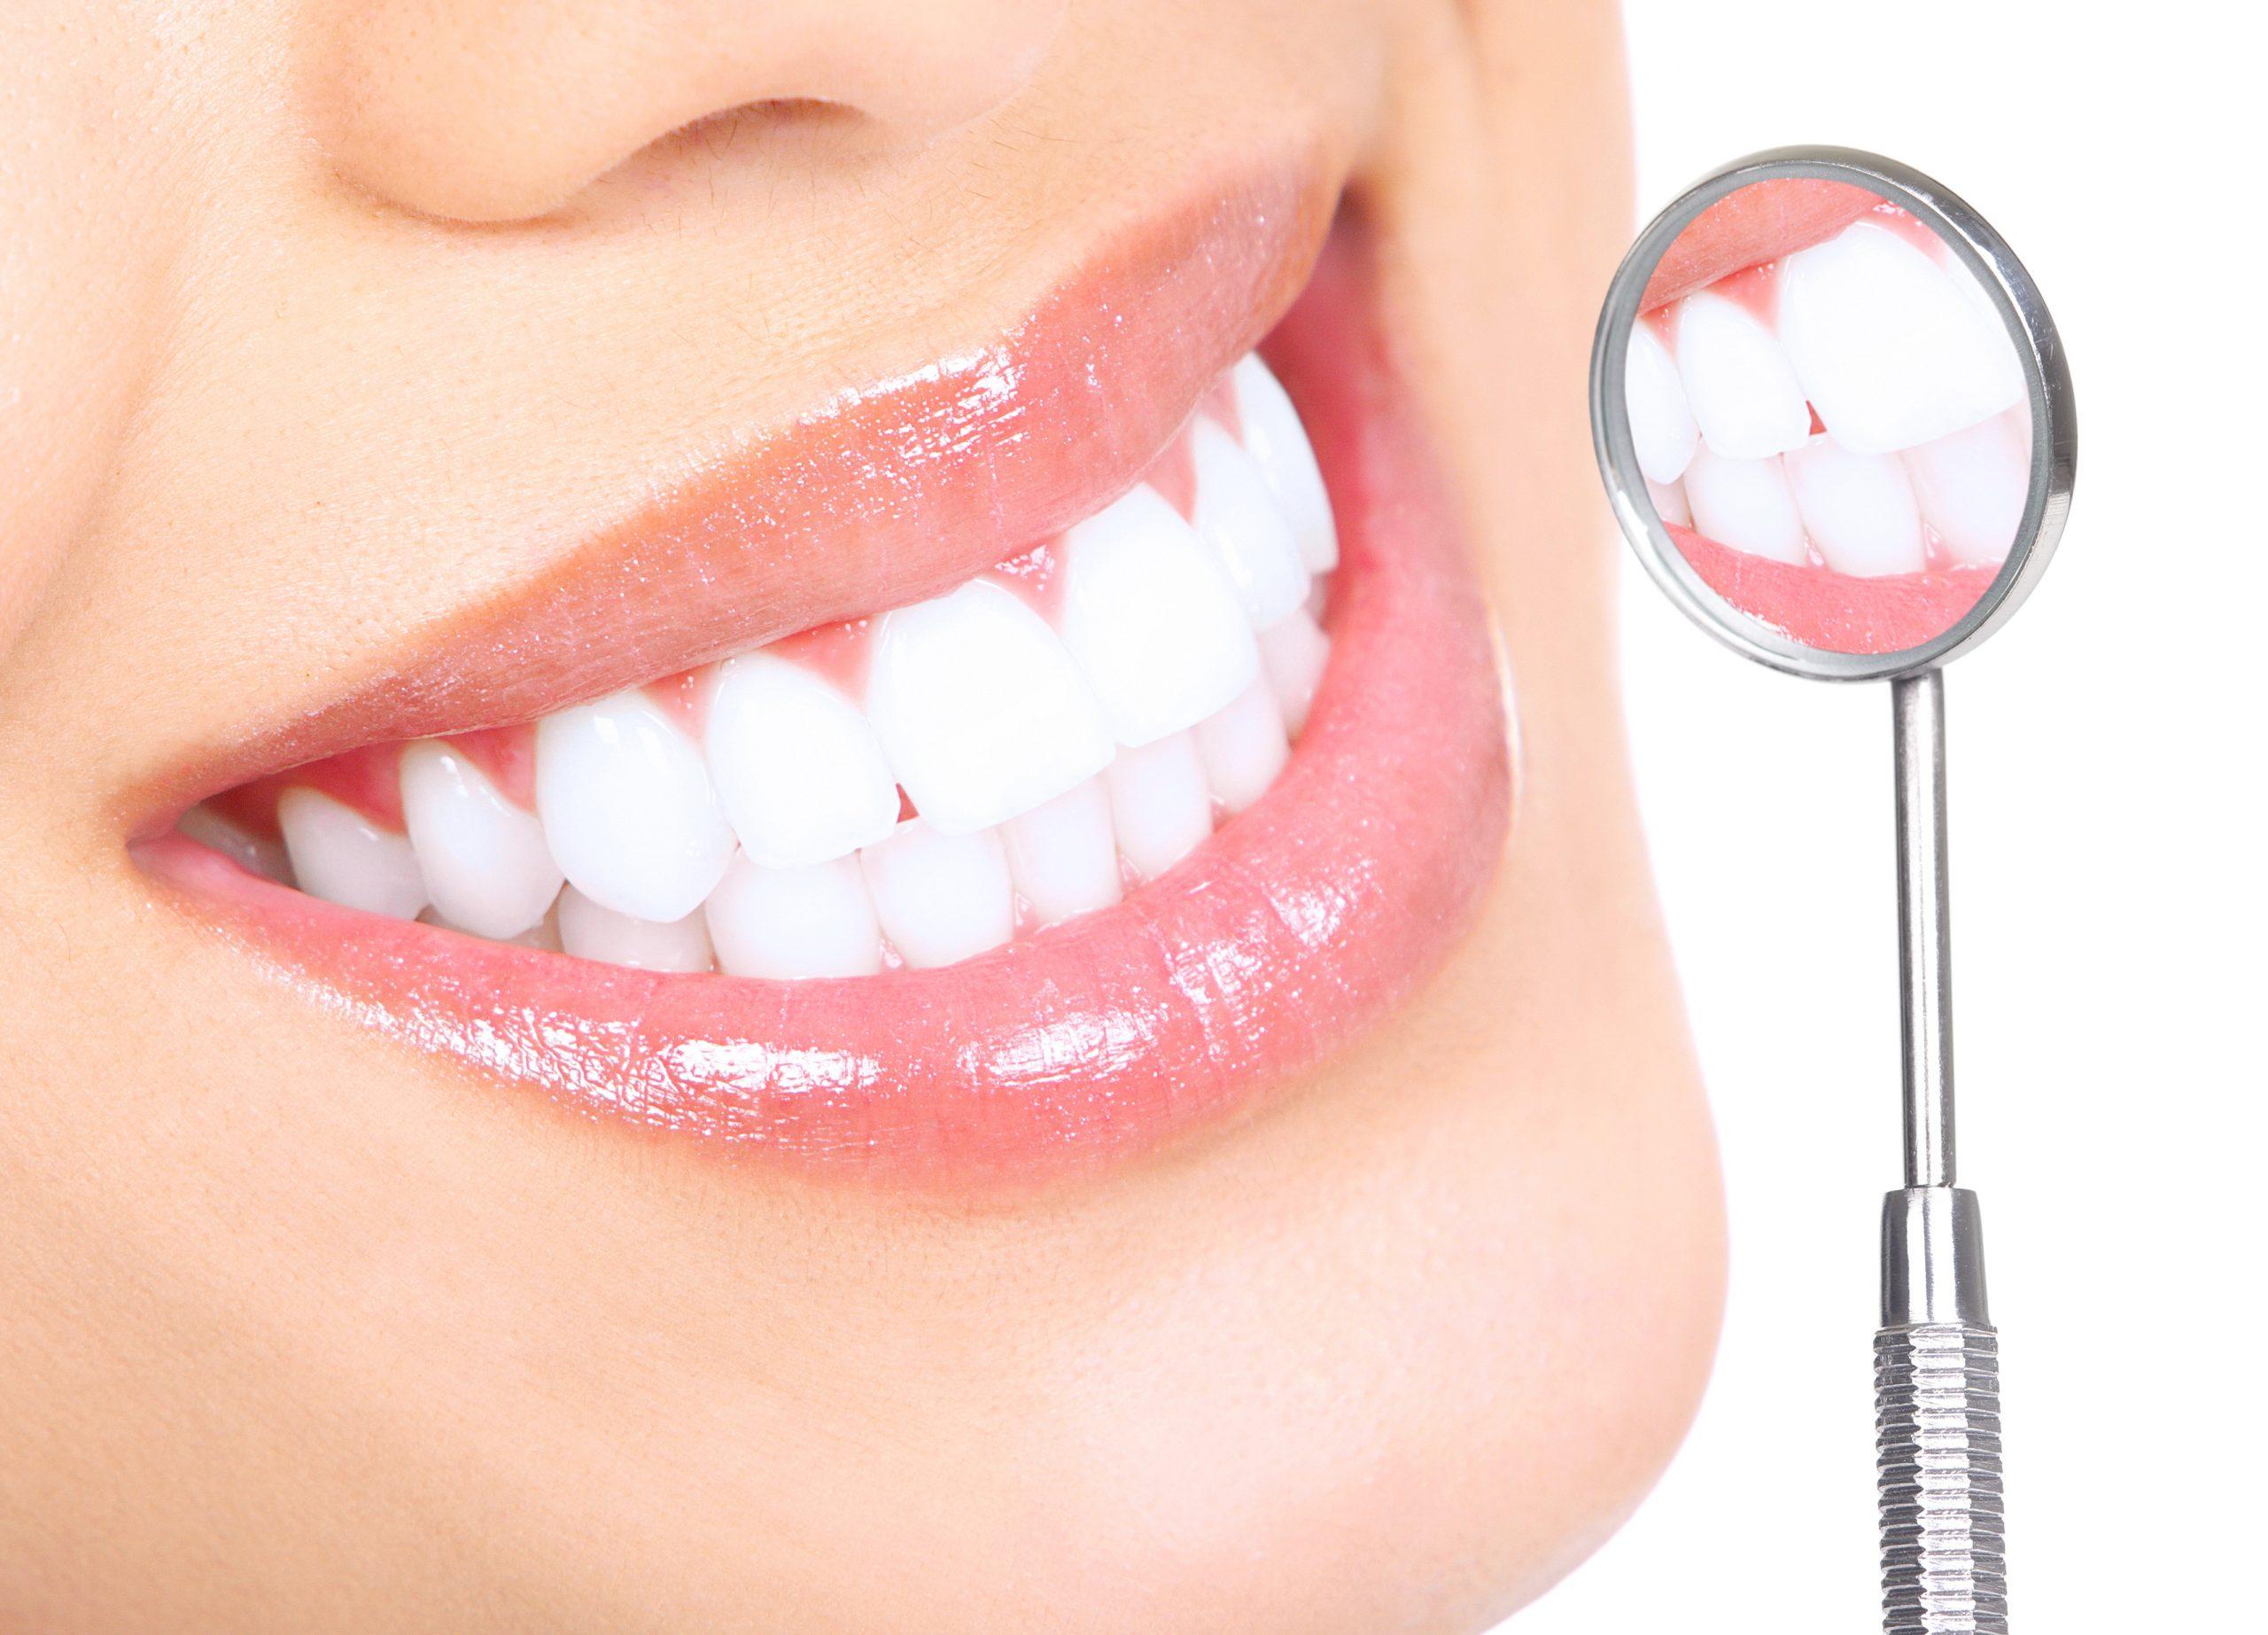 Why Dental Implants And Veneers Are Best